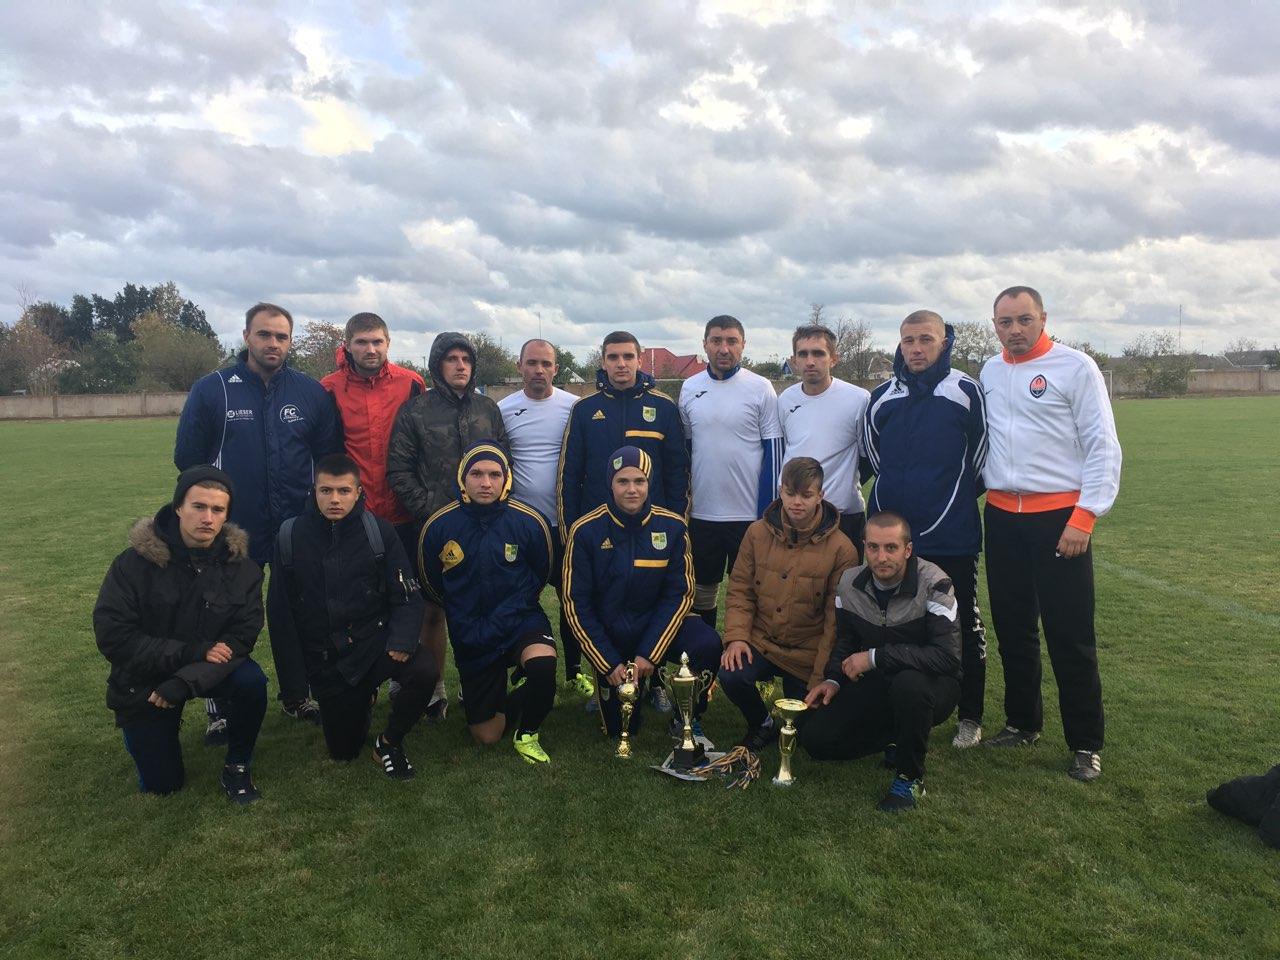 Кубок закриття футбольного сезону в Голопристанському районі